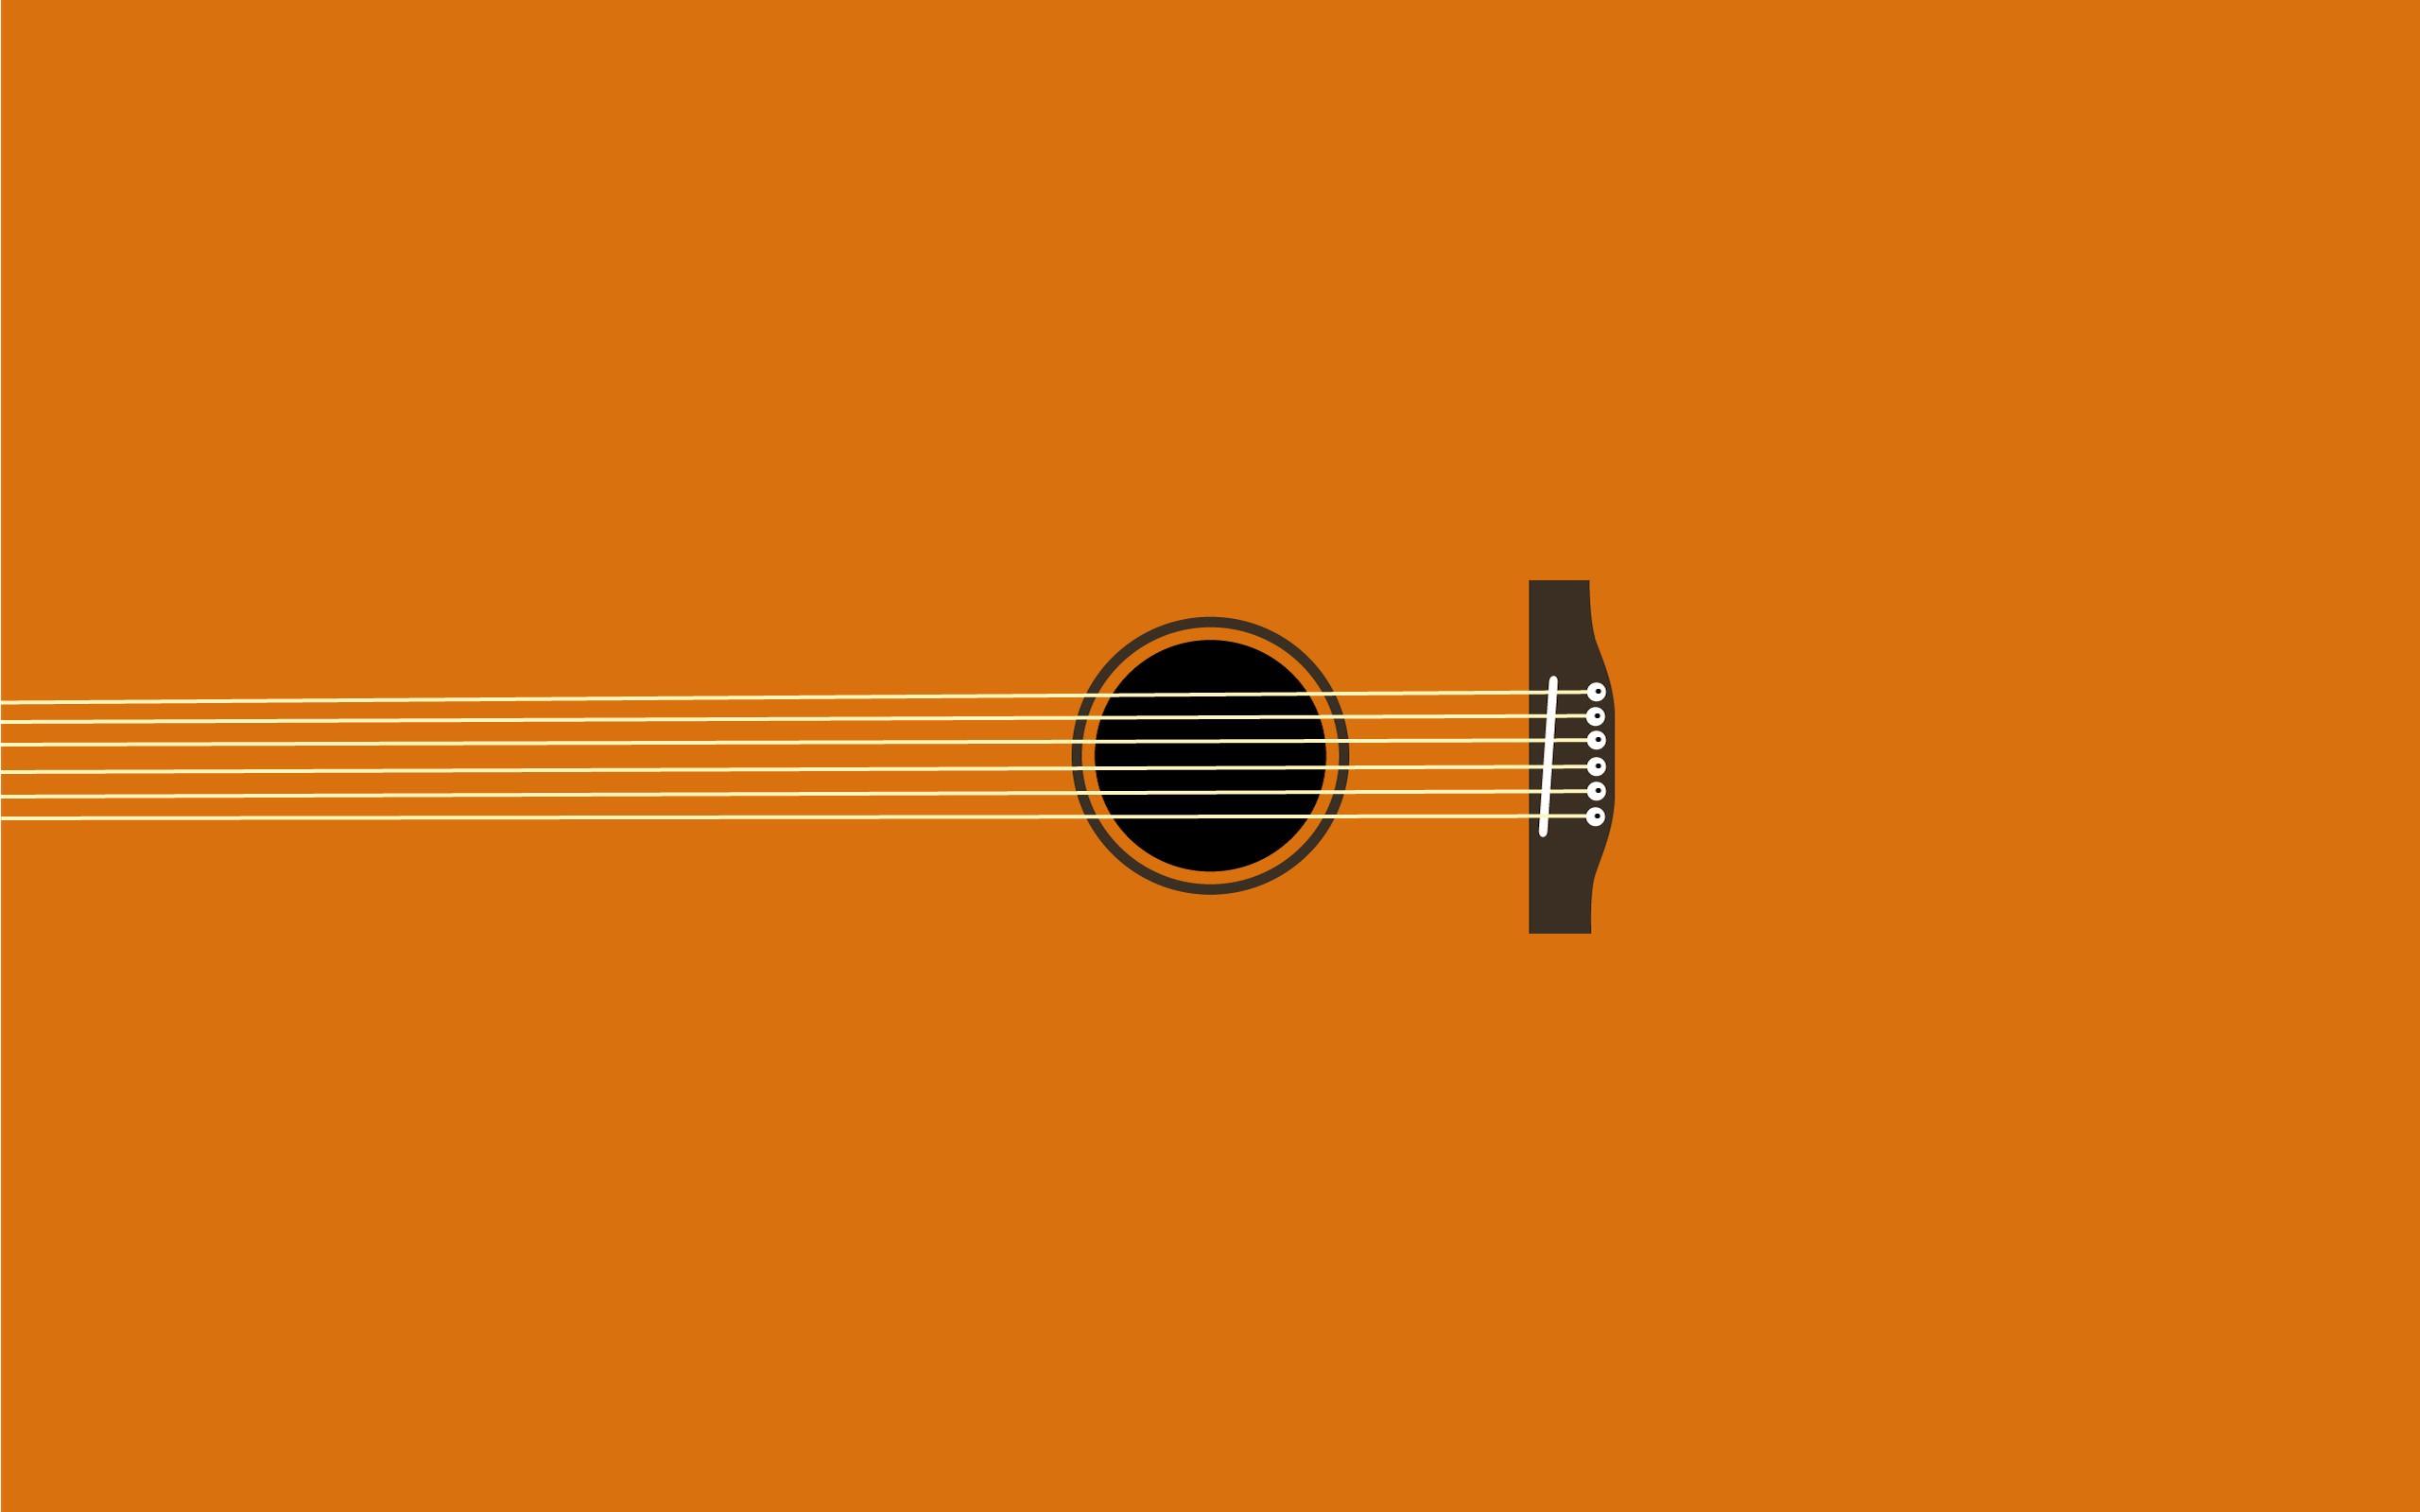 94+ Gambar Alat Musik Yang Dipetik Paling Keren